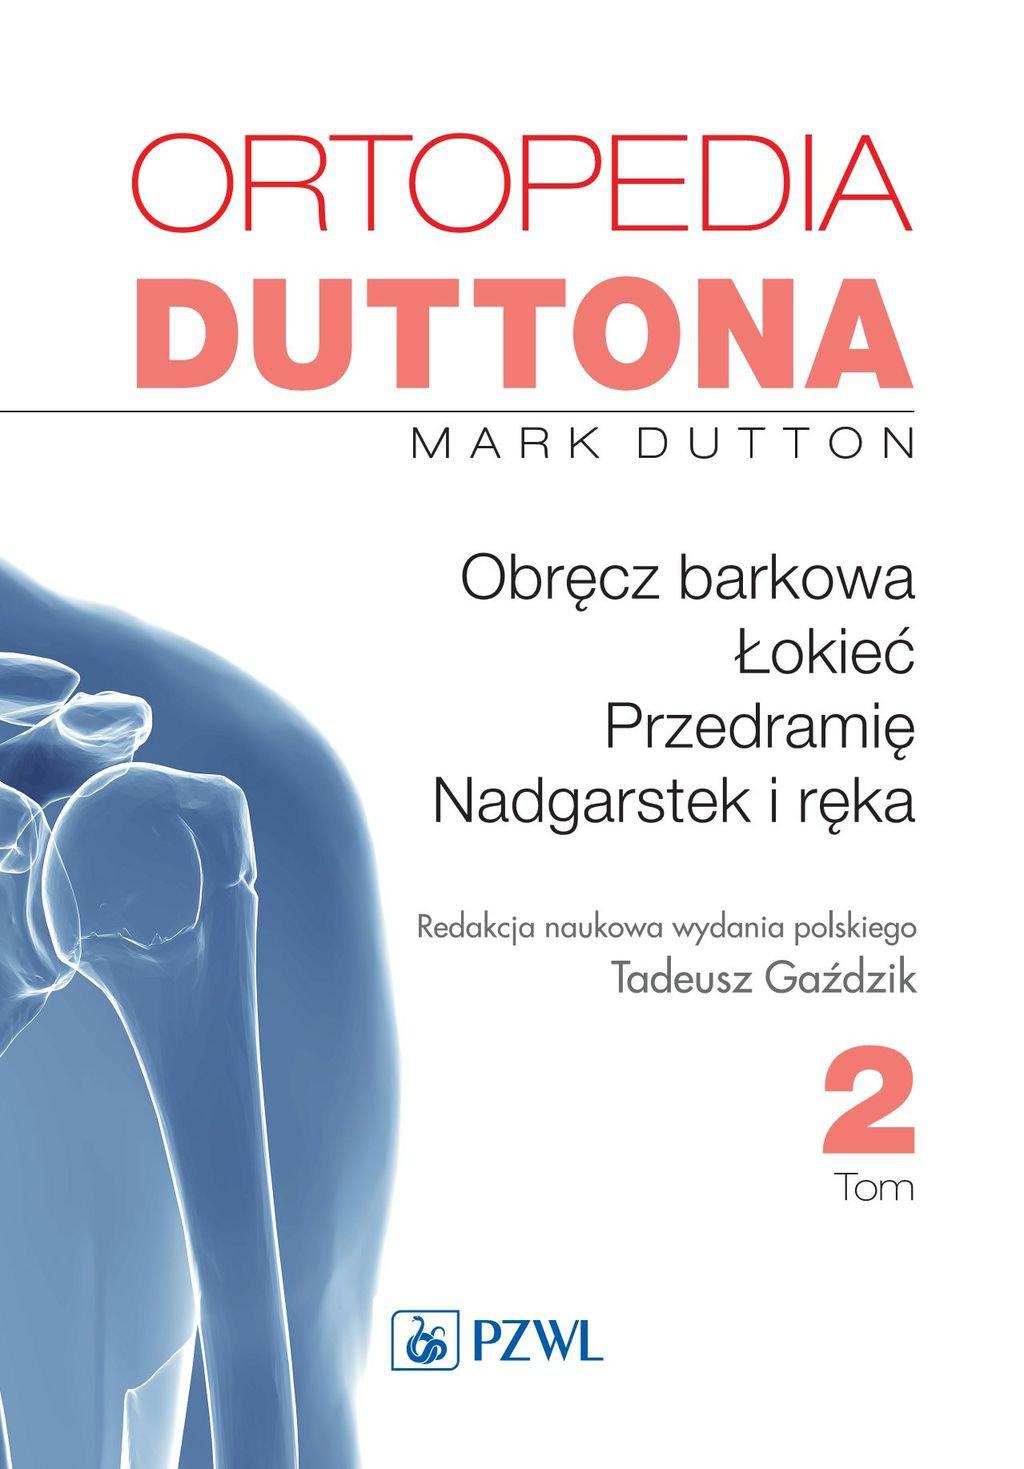 Ortopedia Duttona. Tom 2 - Ebook (Książka na Kindle) do pobrania w formacie MOBI